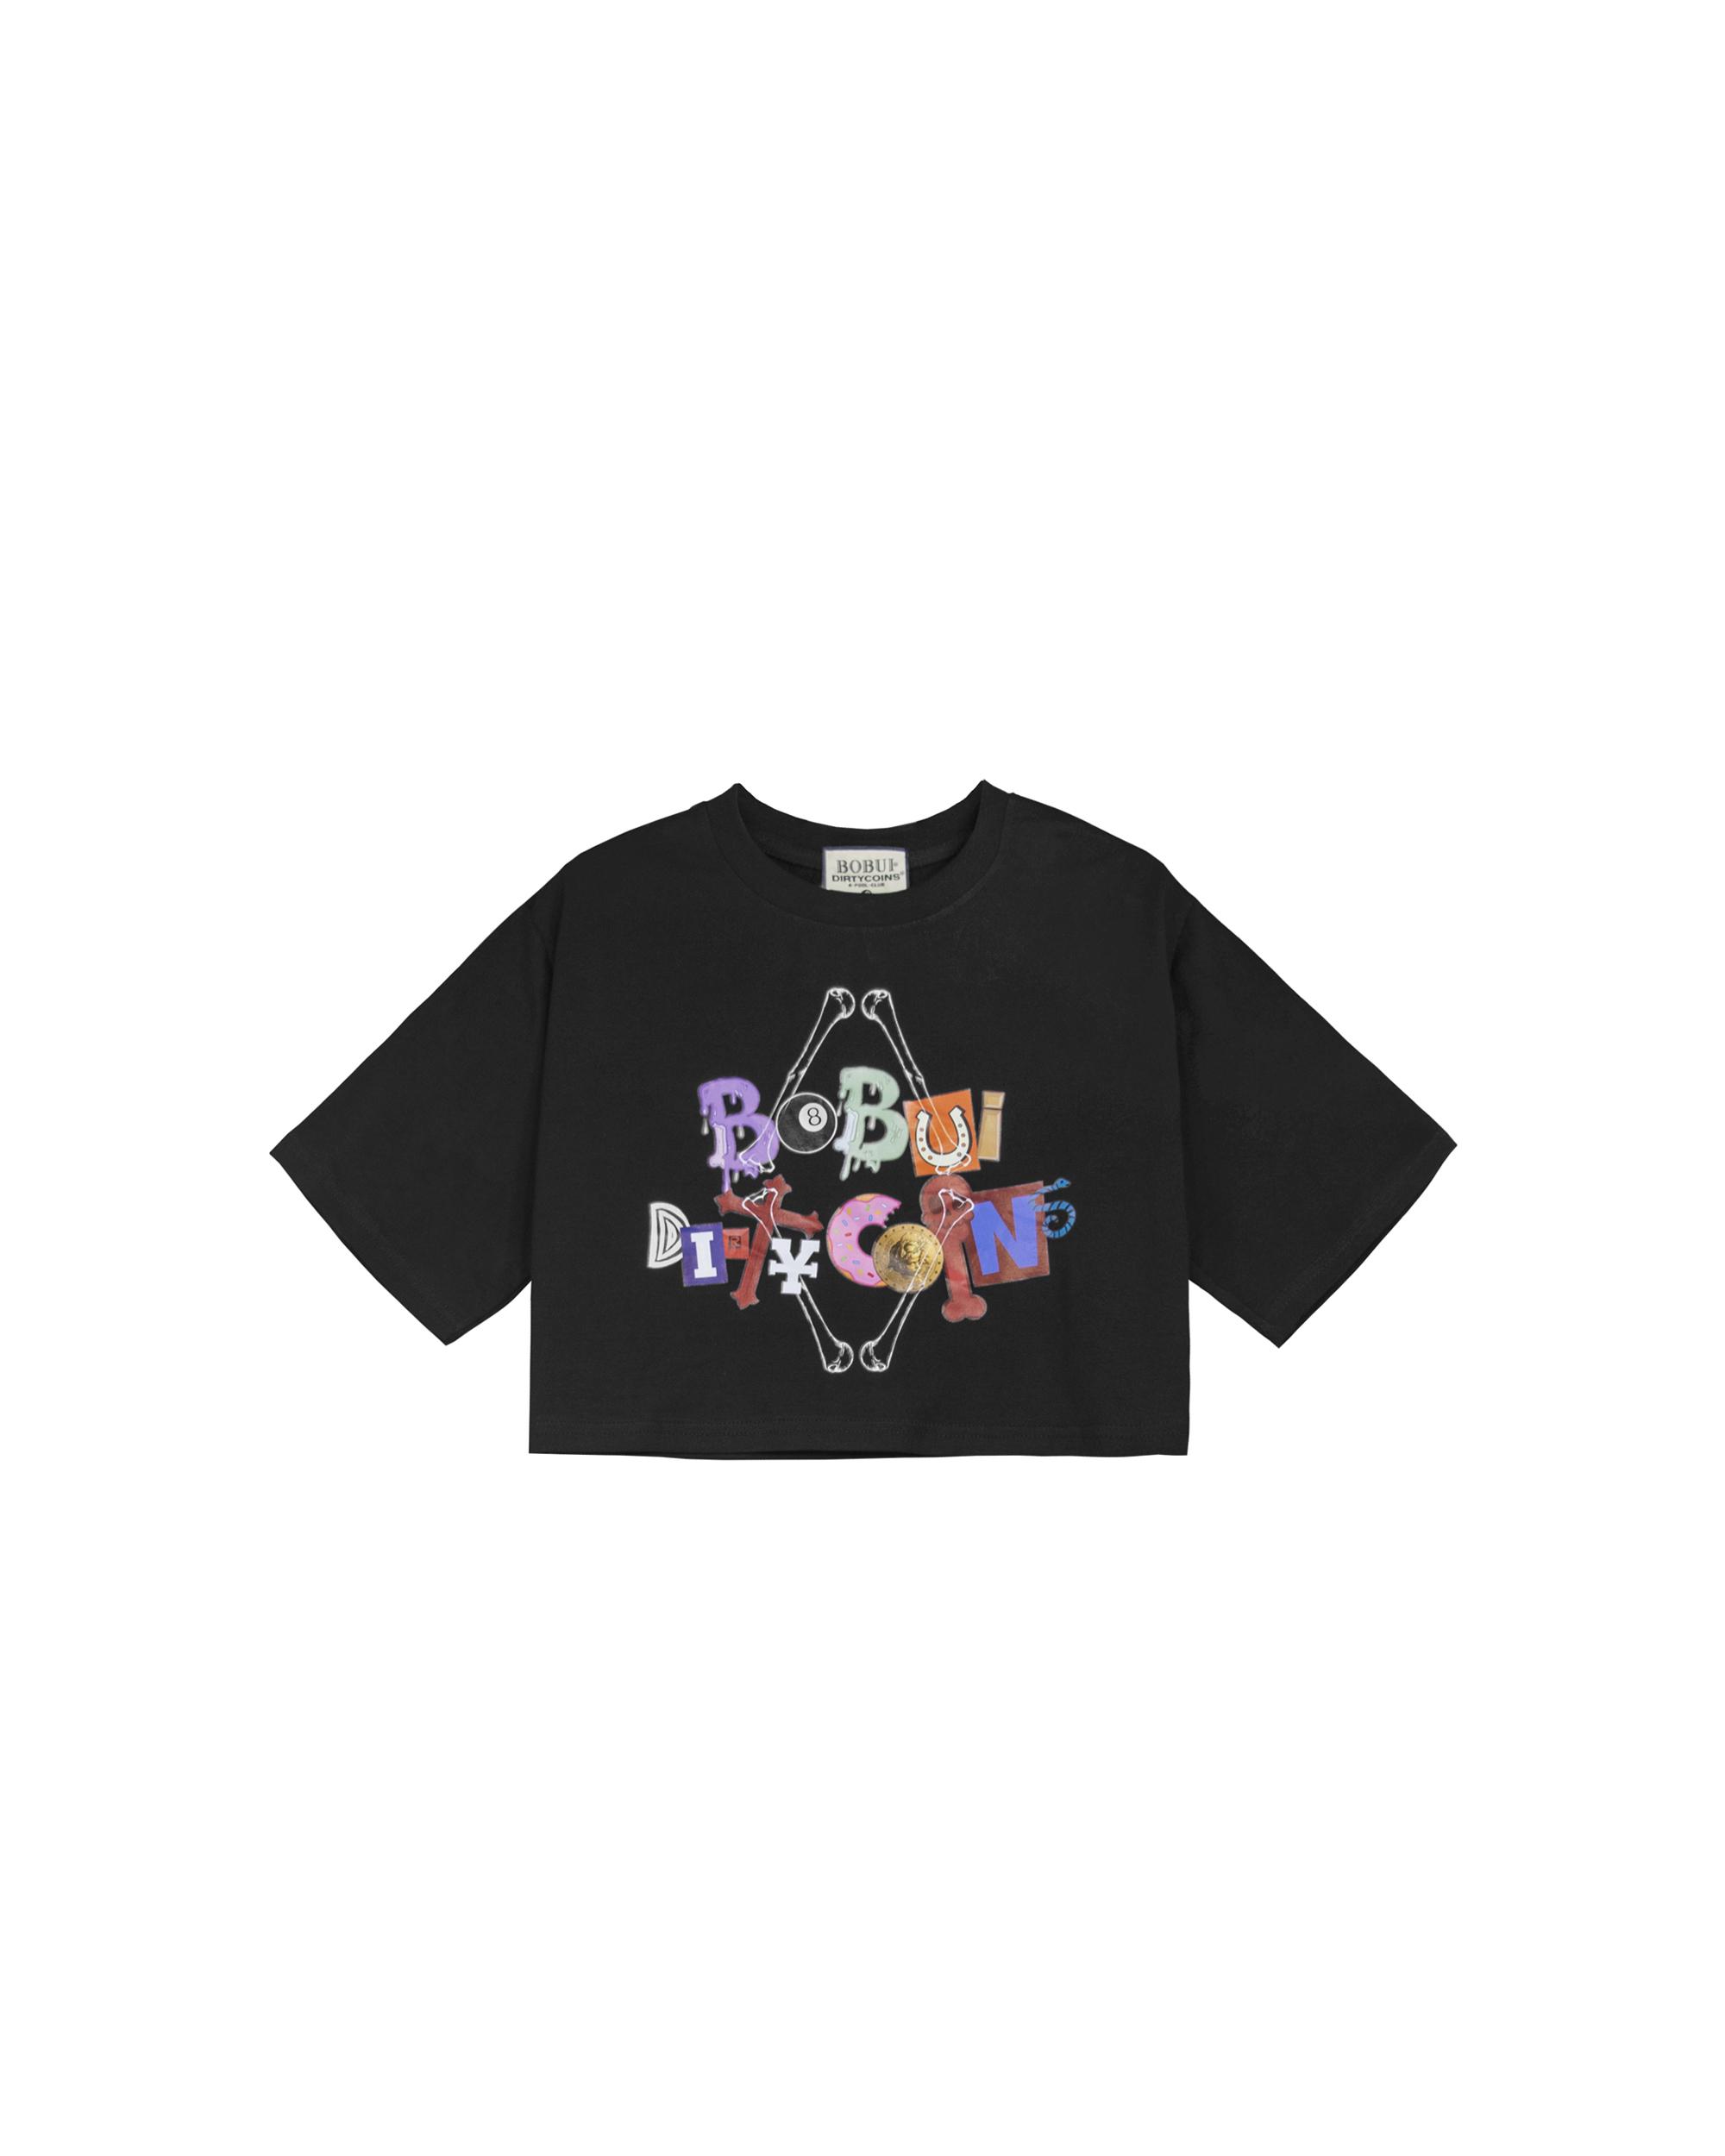 BXD - LOGO CROPTOP - BLACK